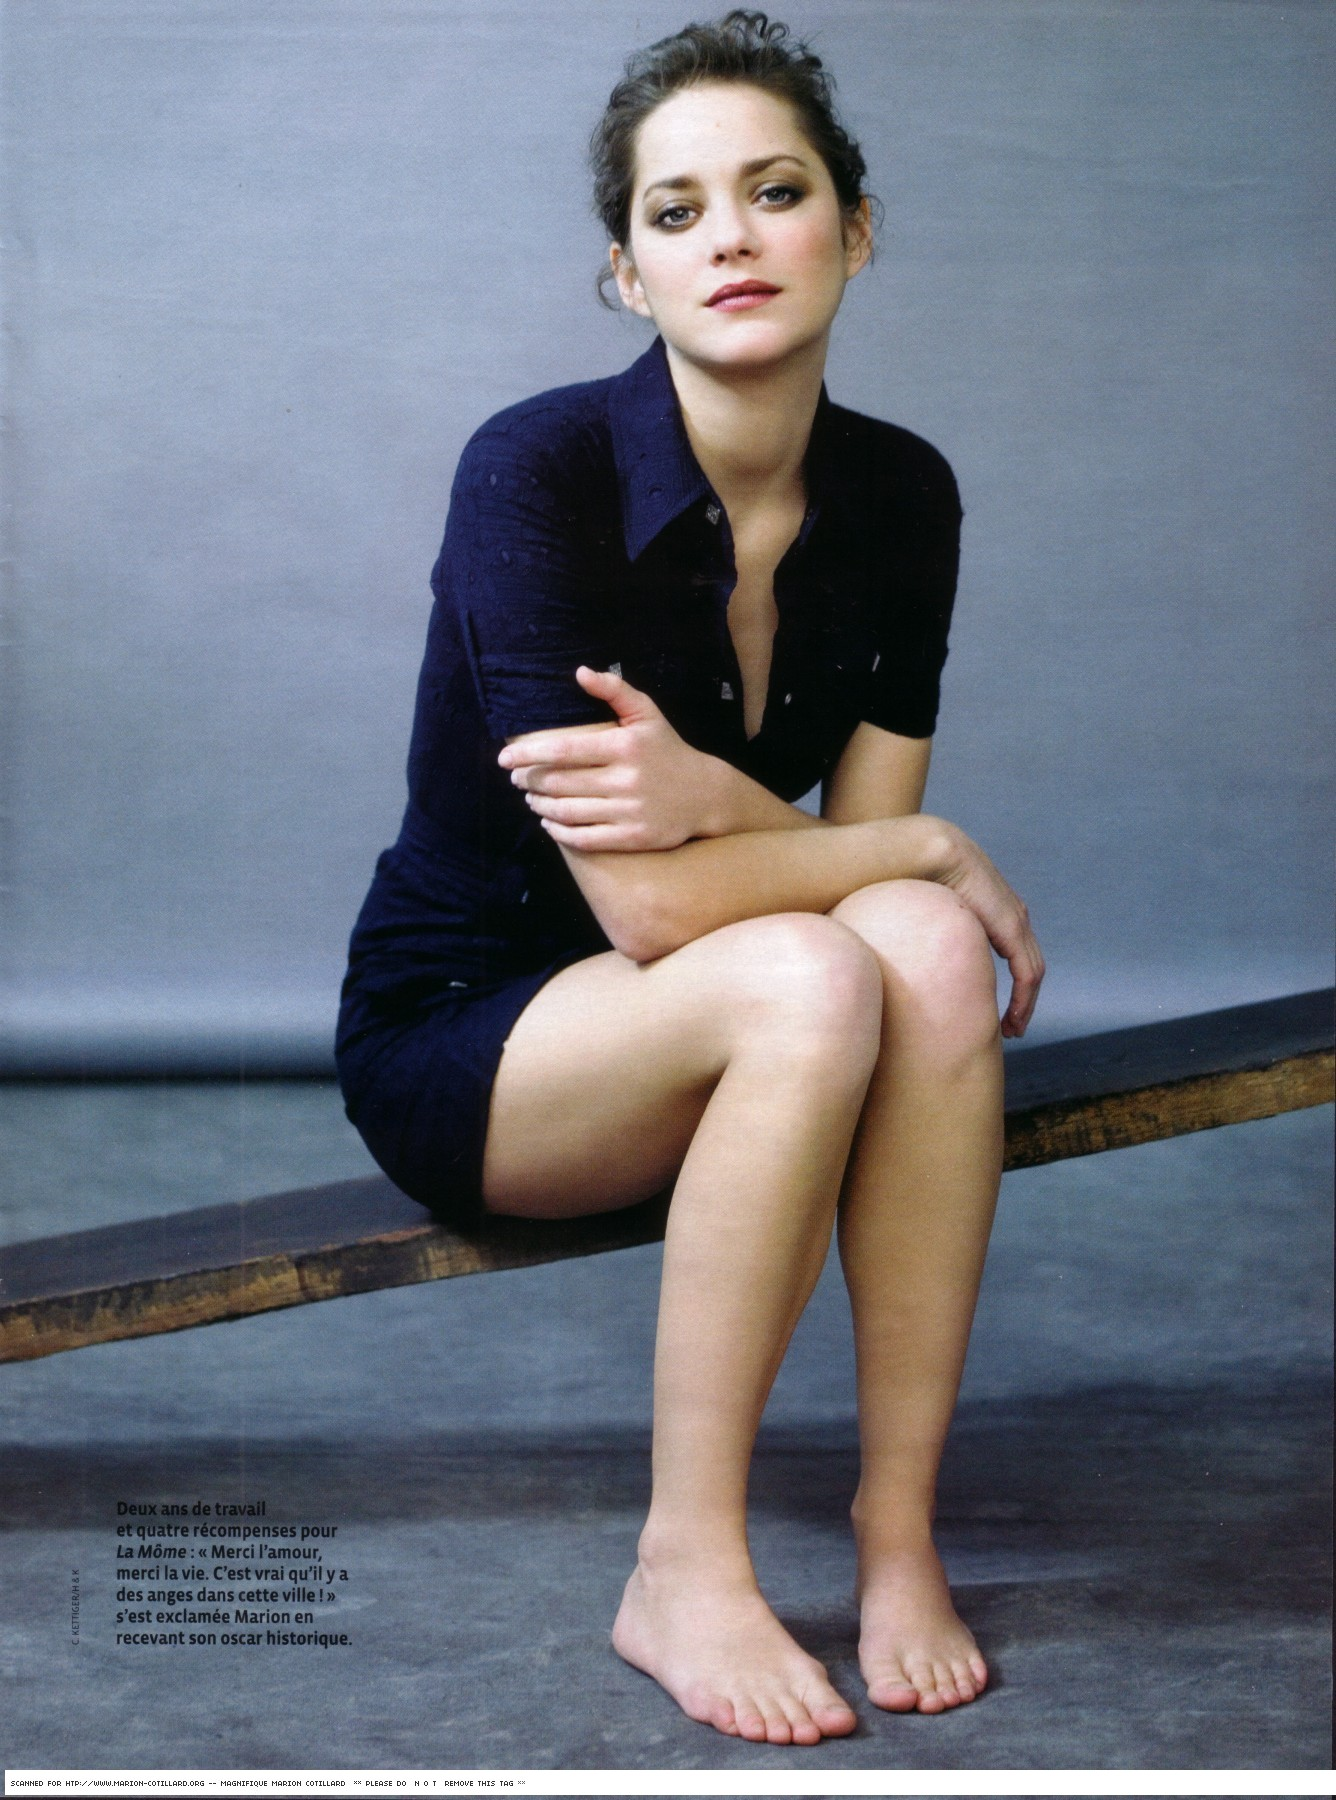 Digitalminx.com - Actresses - Marion Cotillard Marion Cotillard